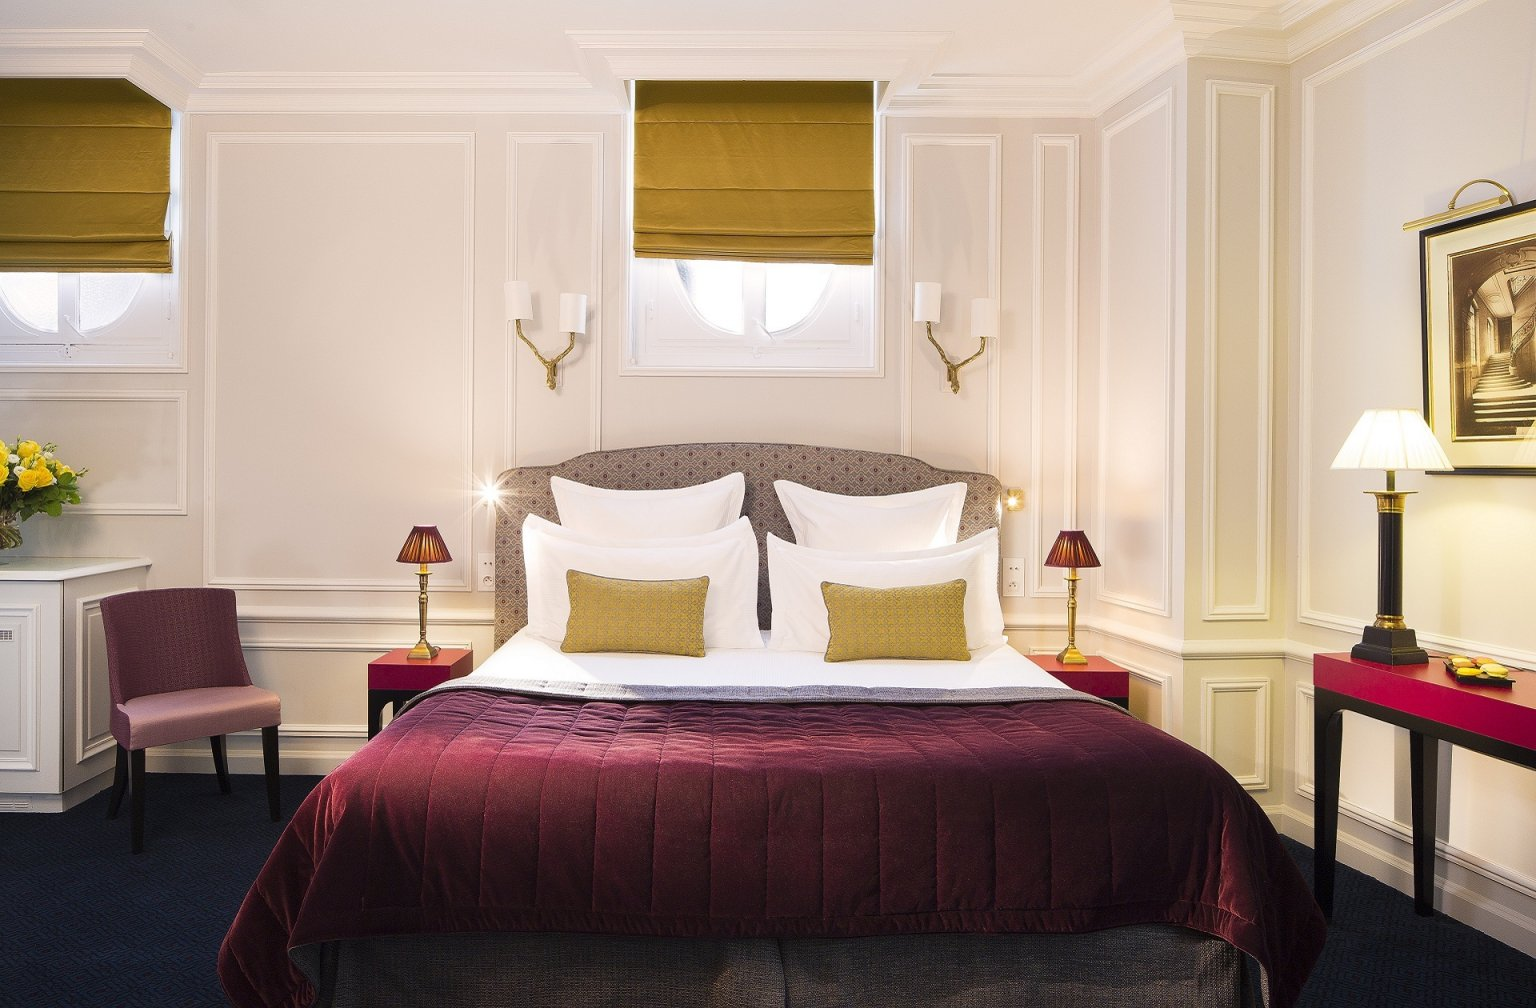 Les chambres | Hôtel Bourgogne & Montana